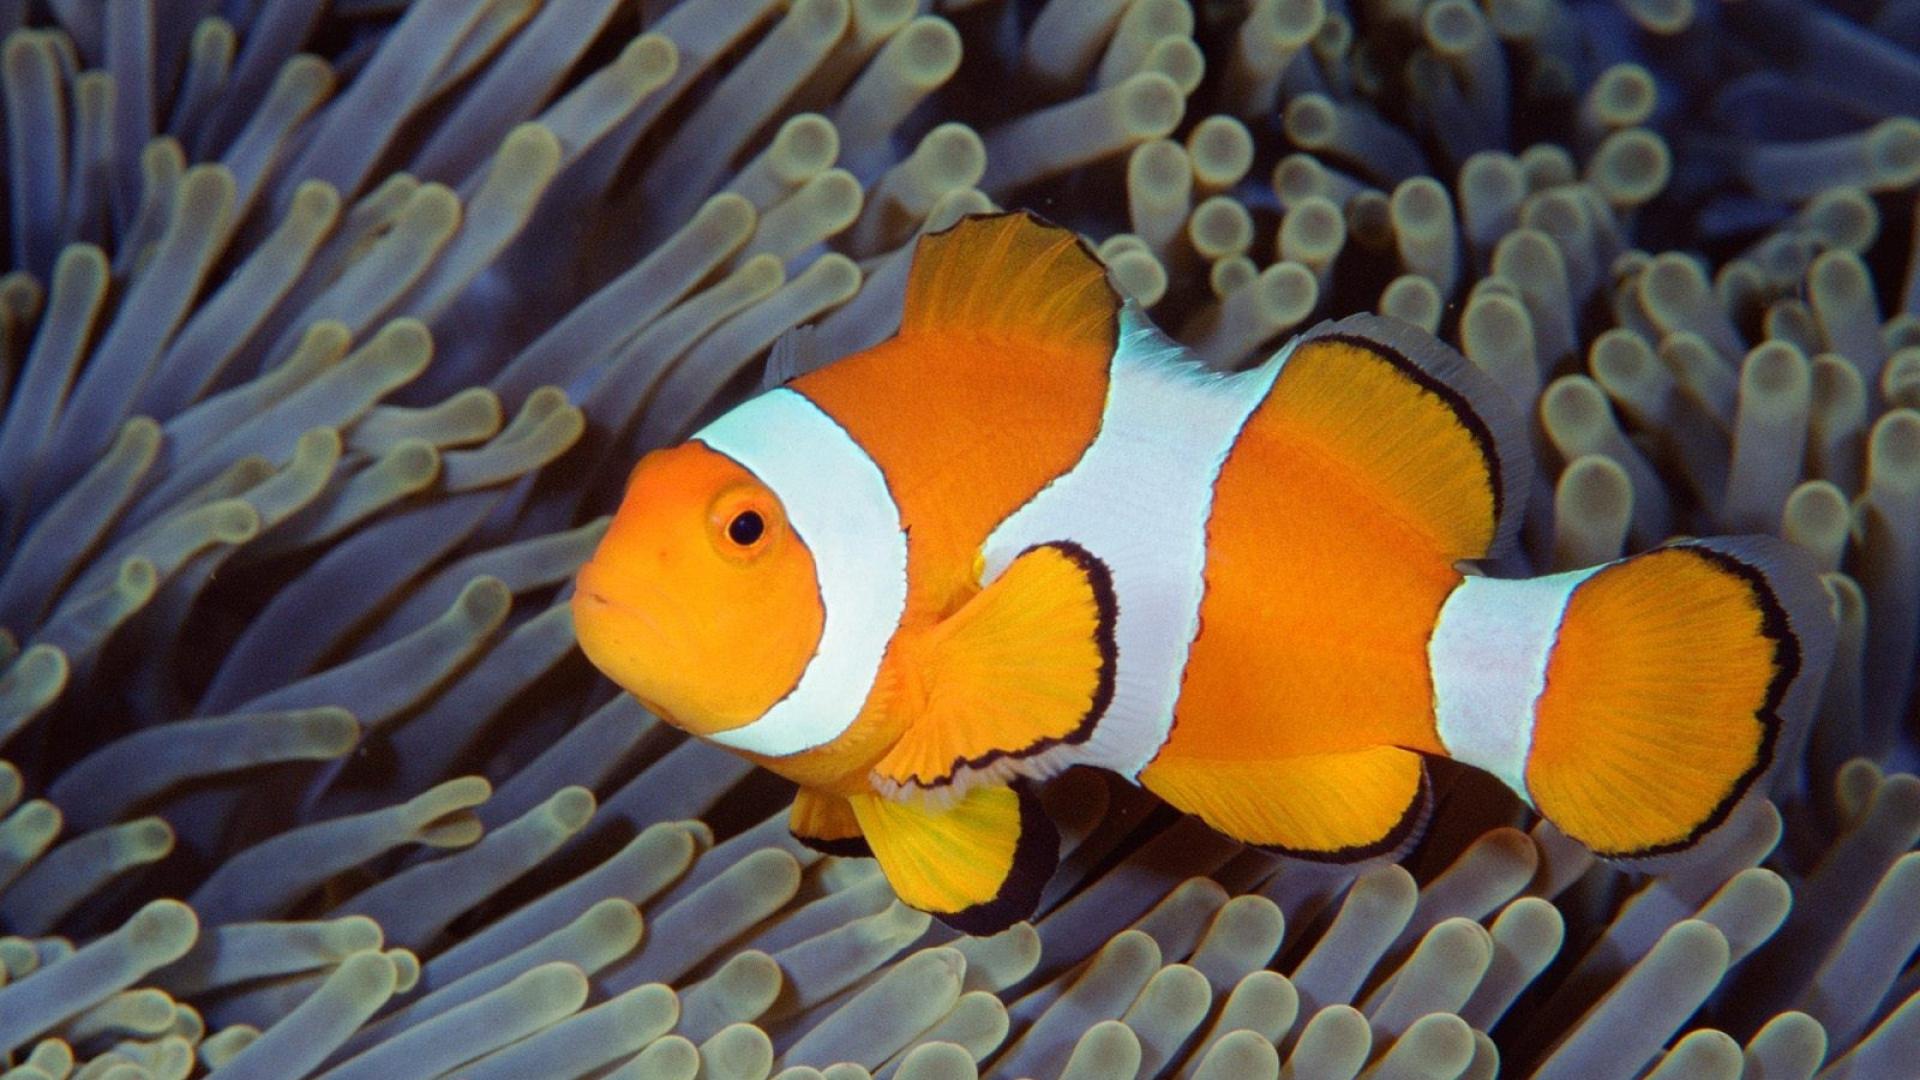 Fish-bali-indonesia-underwater-sea-ocean-1920x1080-Need-iPhone-S-Plus-Background-wallpaper-wp3605582